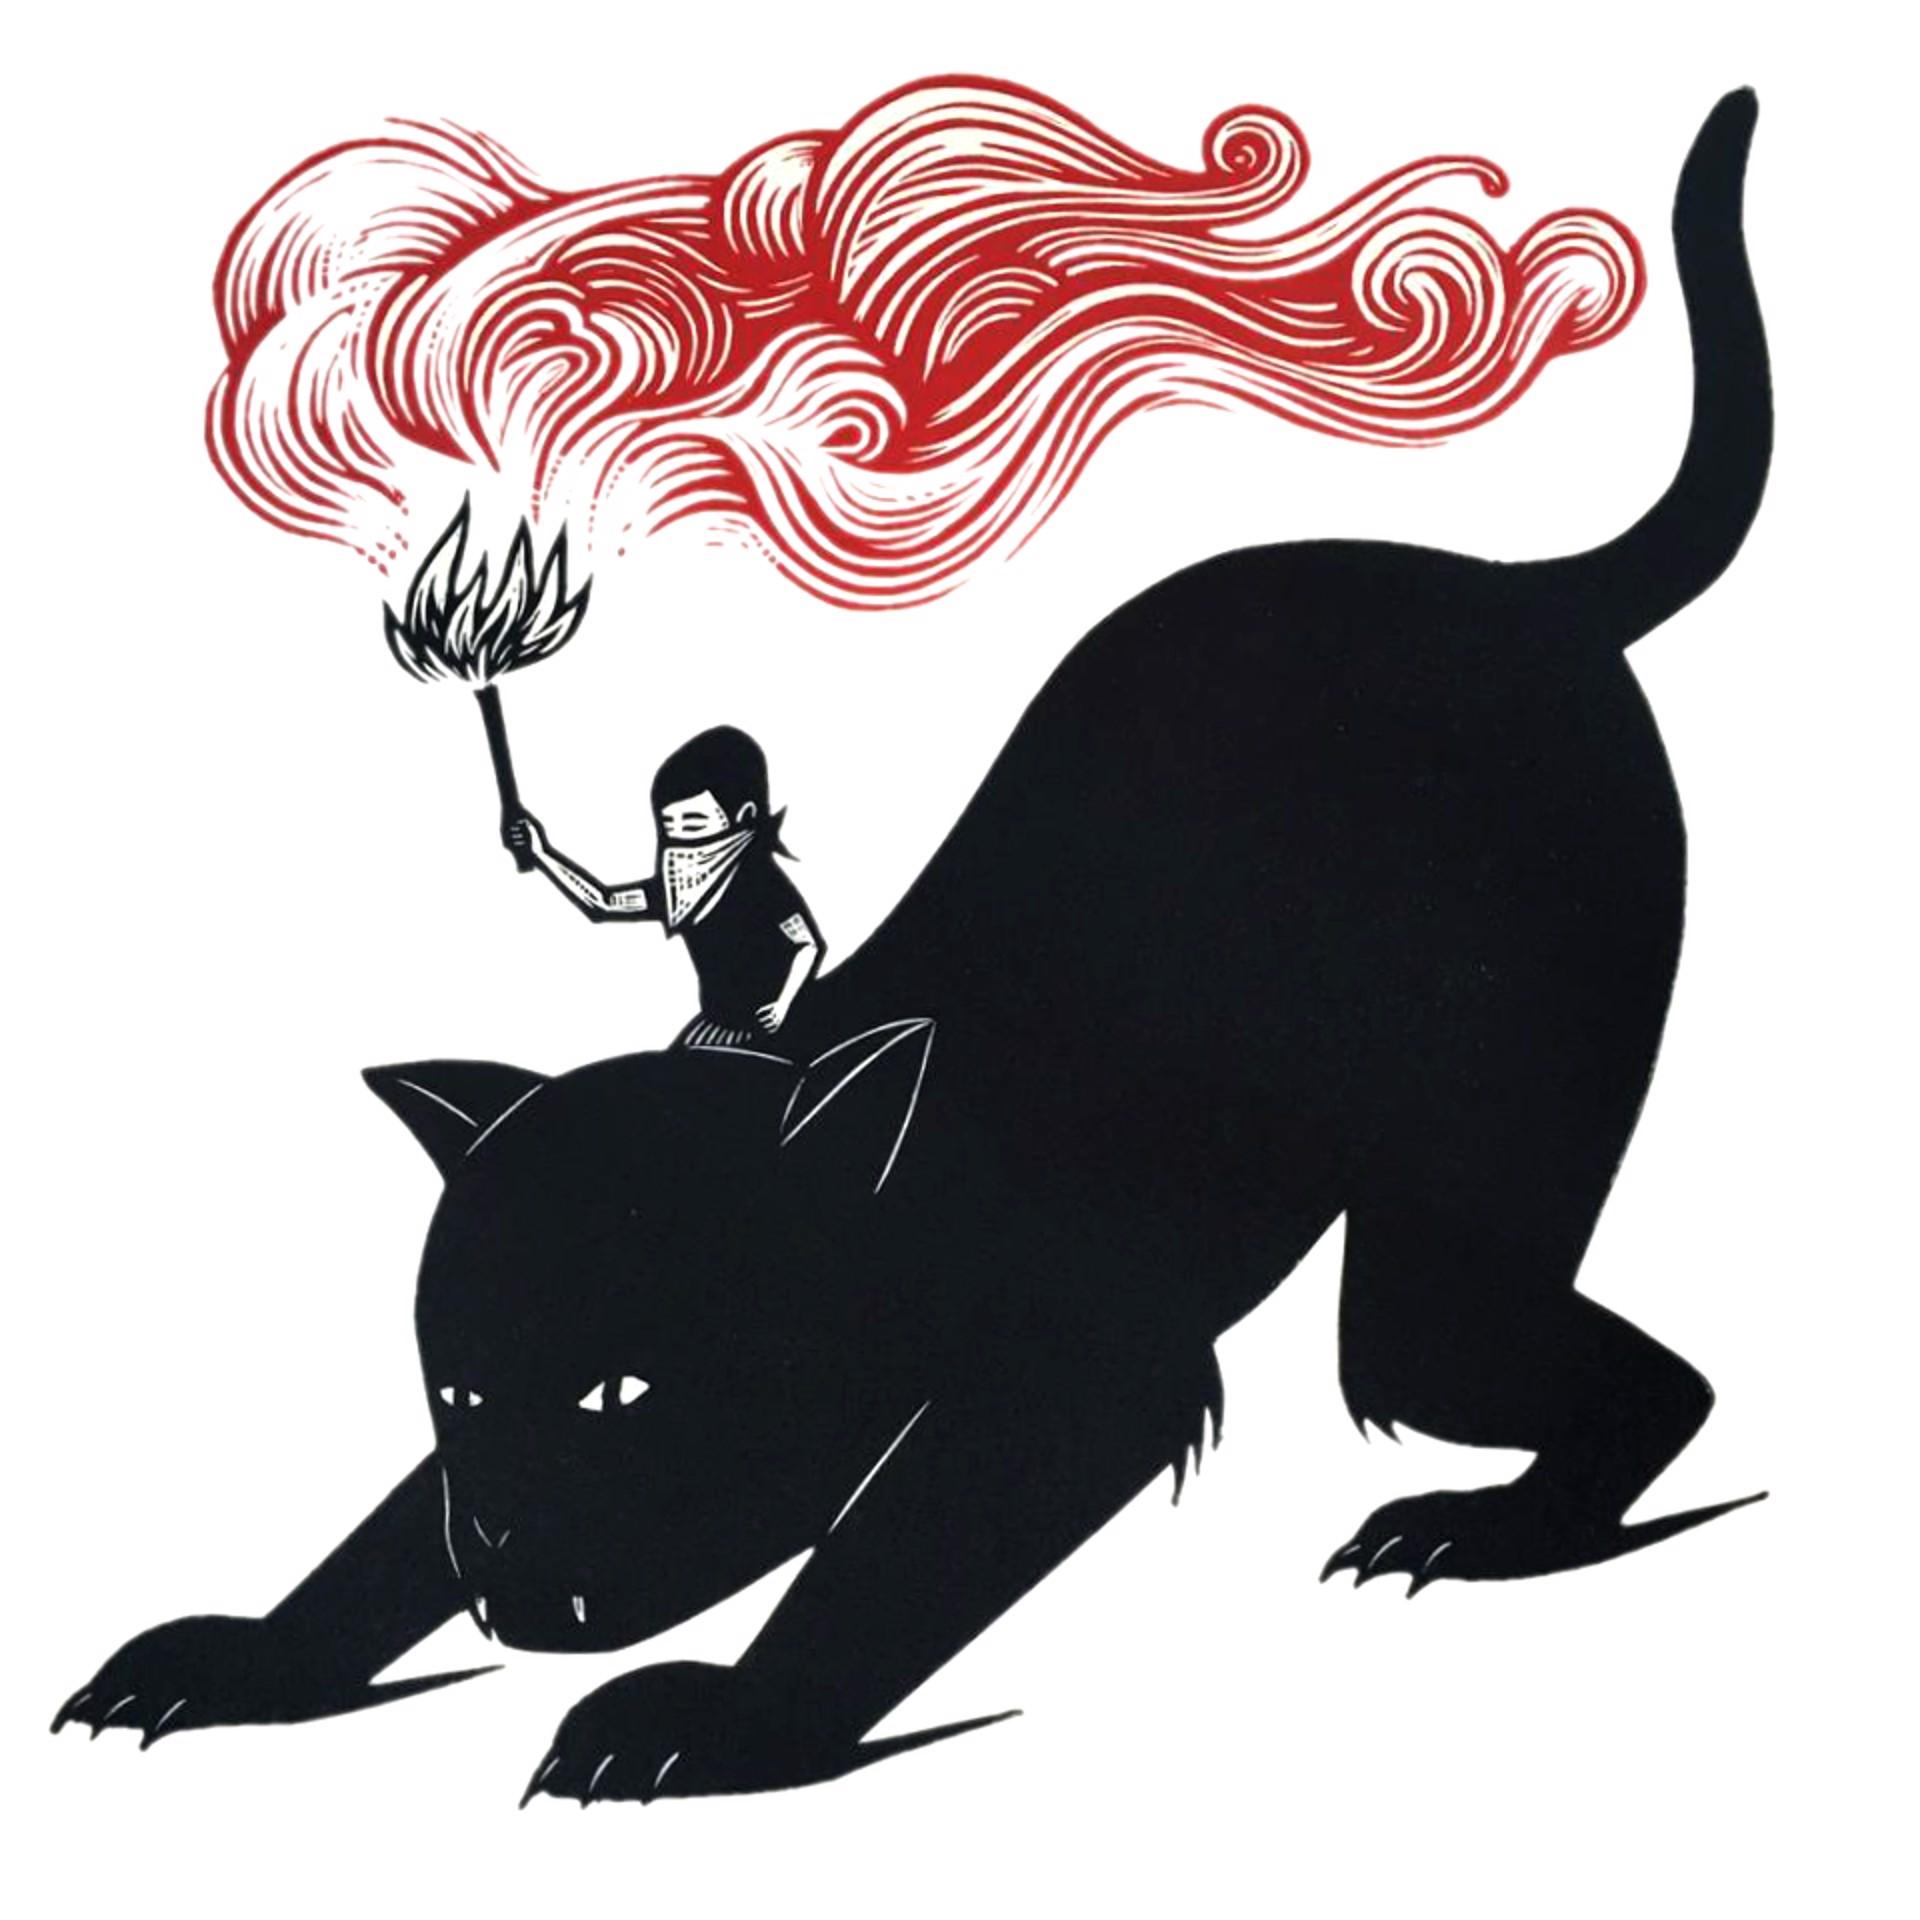 Untitled (Gato) by Alberto Cruz